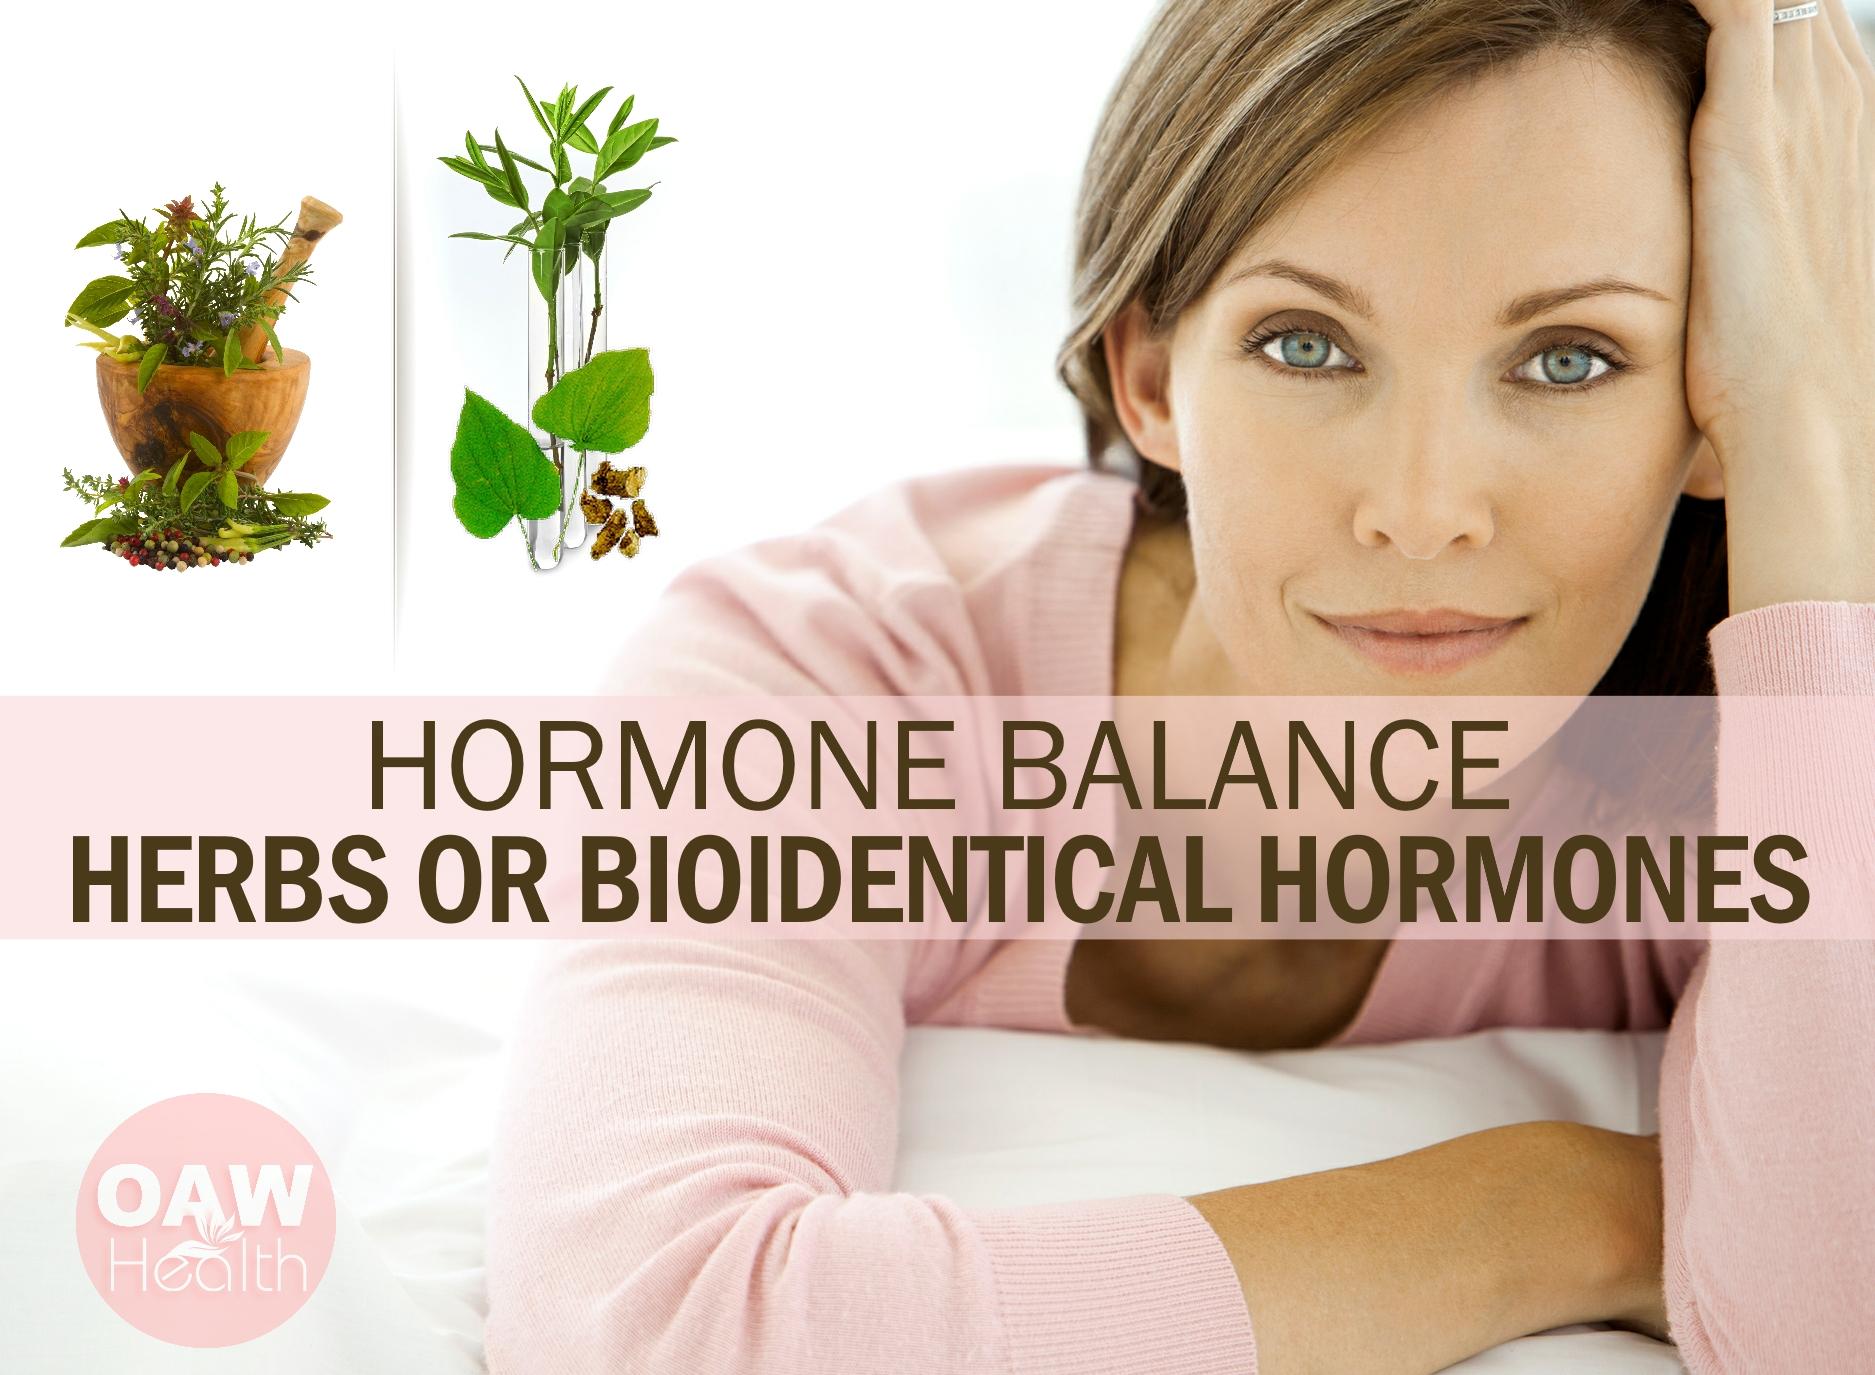 Hormone Balance – Herbs or Bioidentical Hormones?